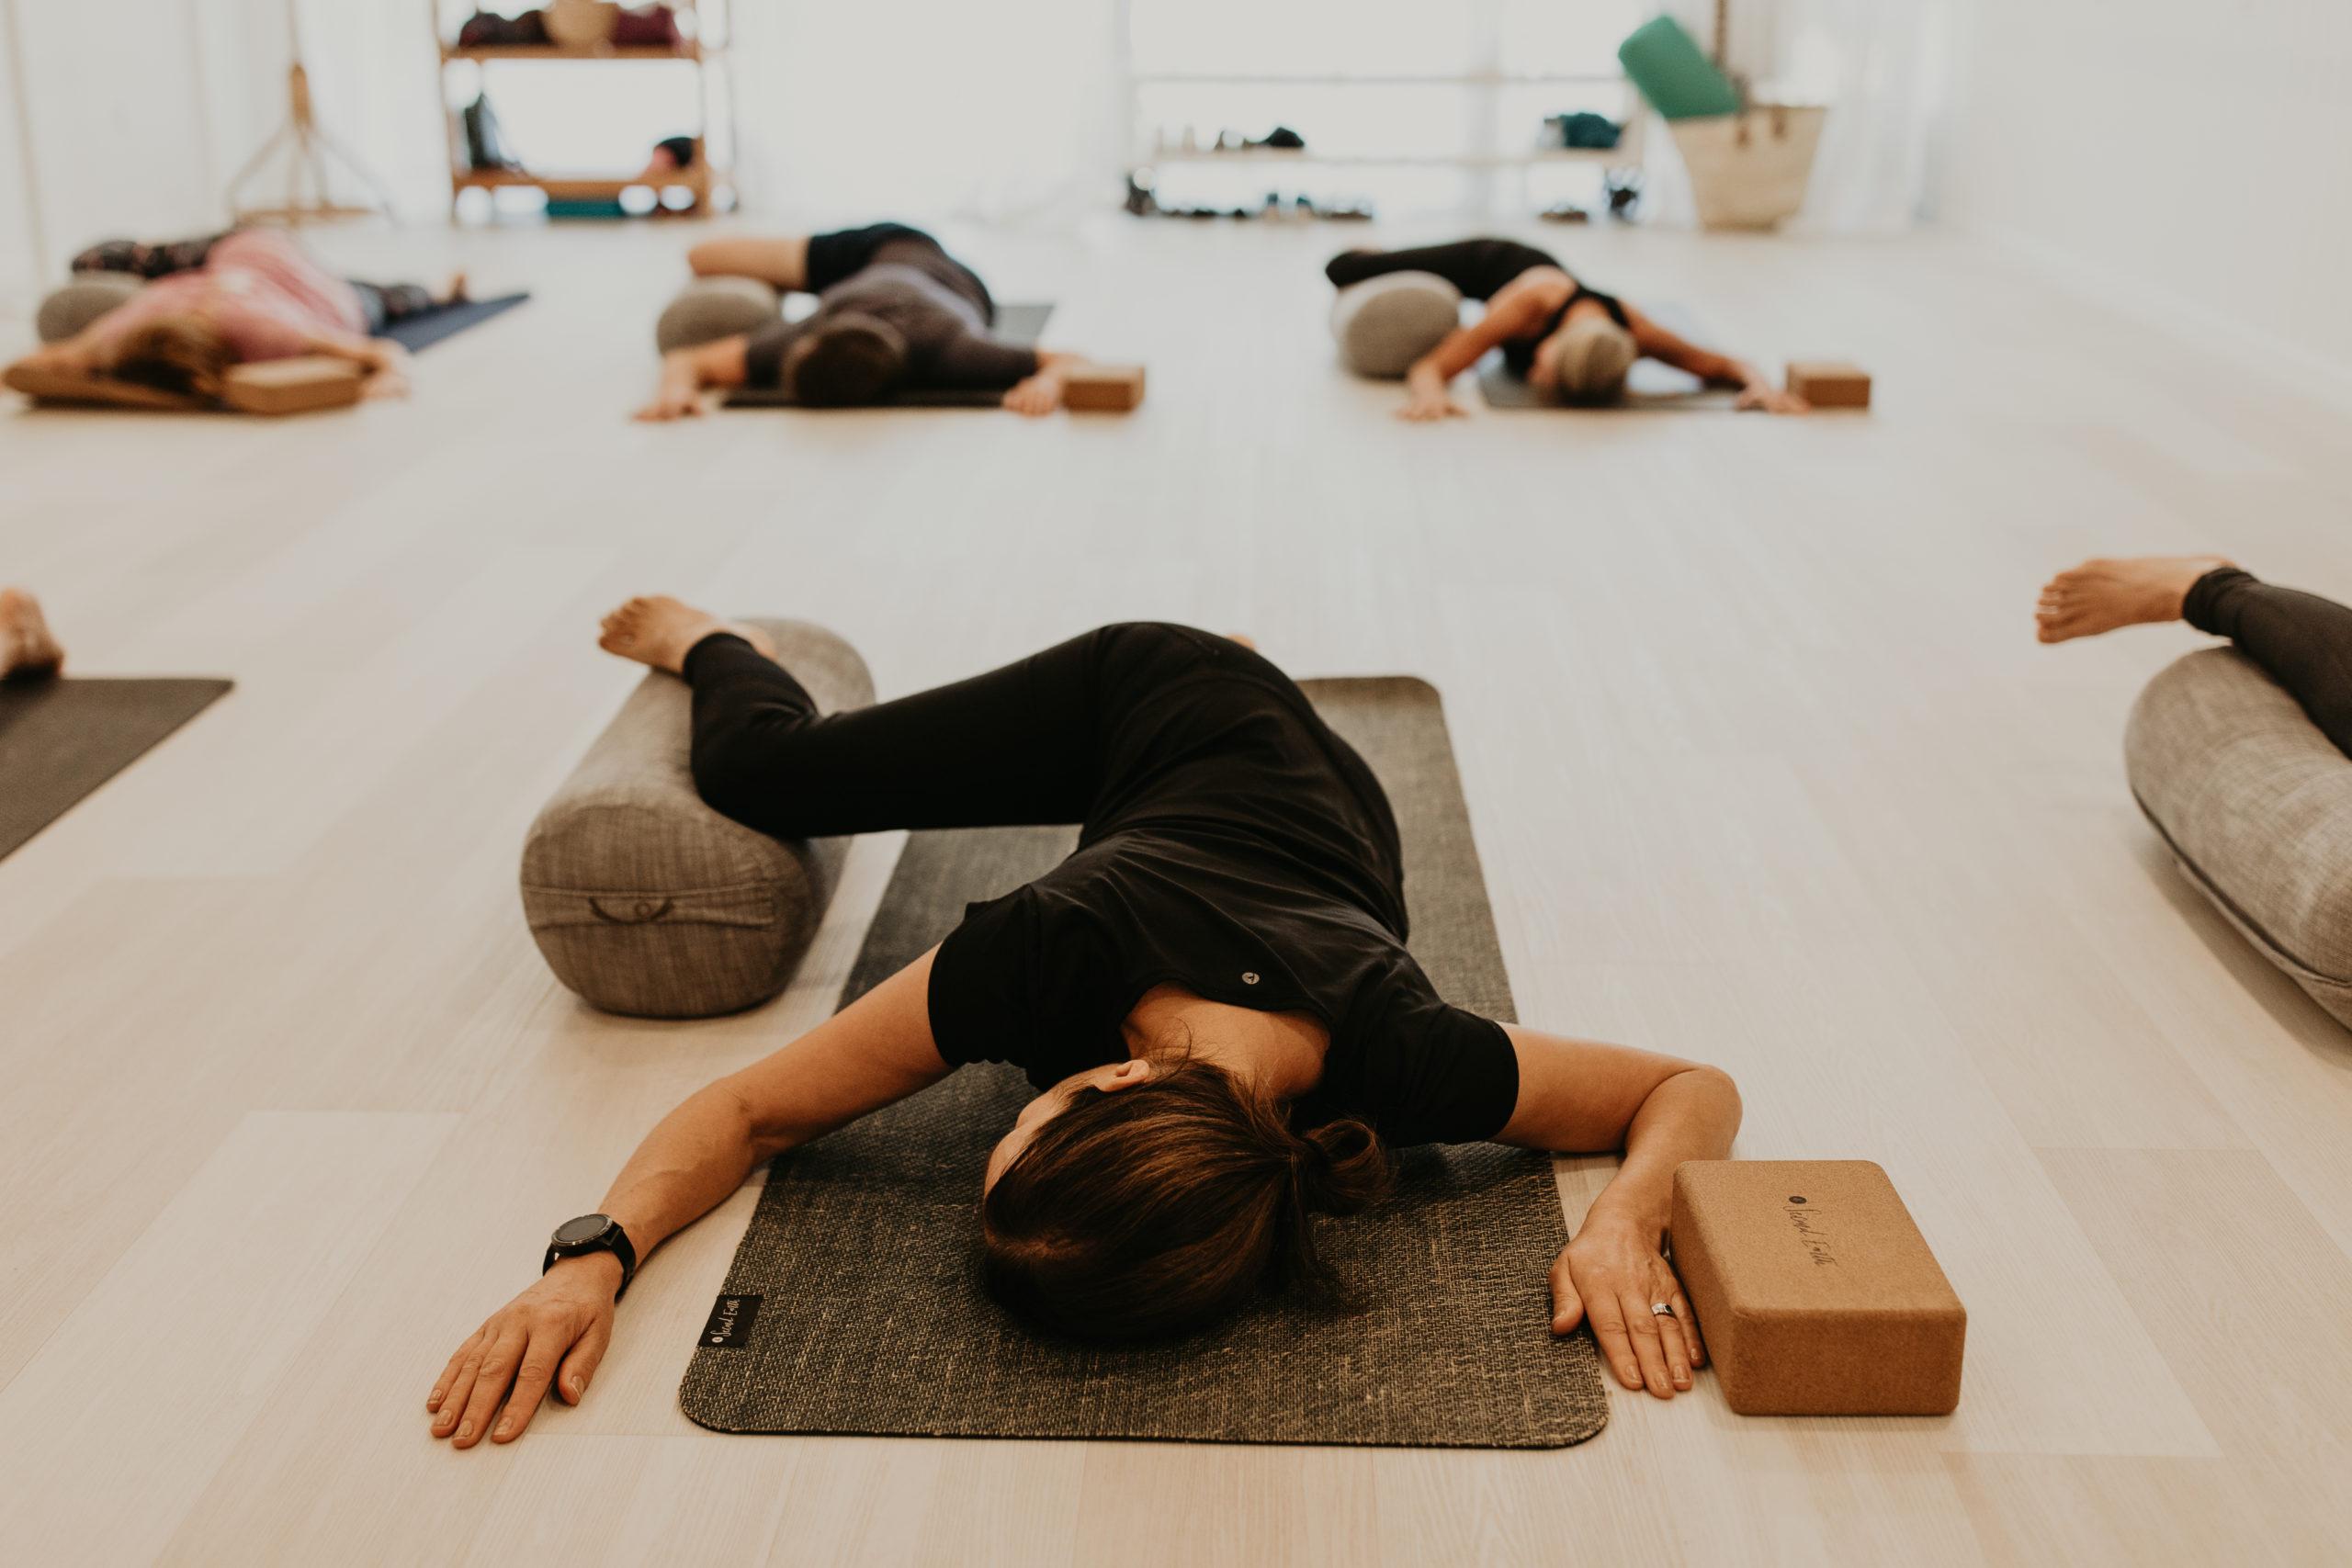 Yoga wellness course event workshop buderim lady yin